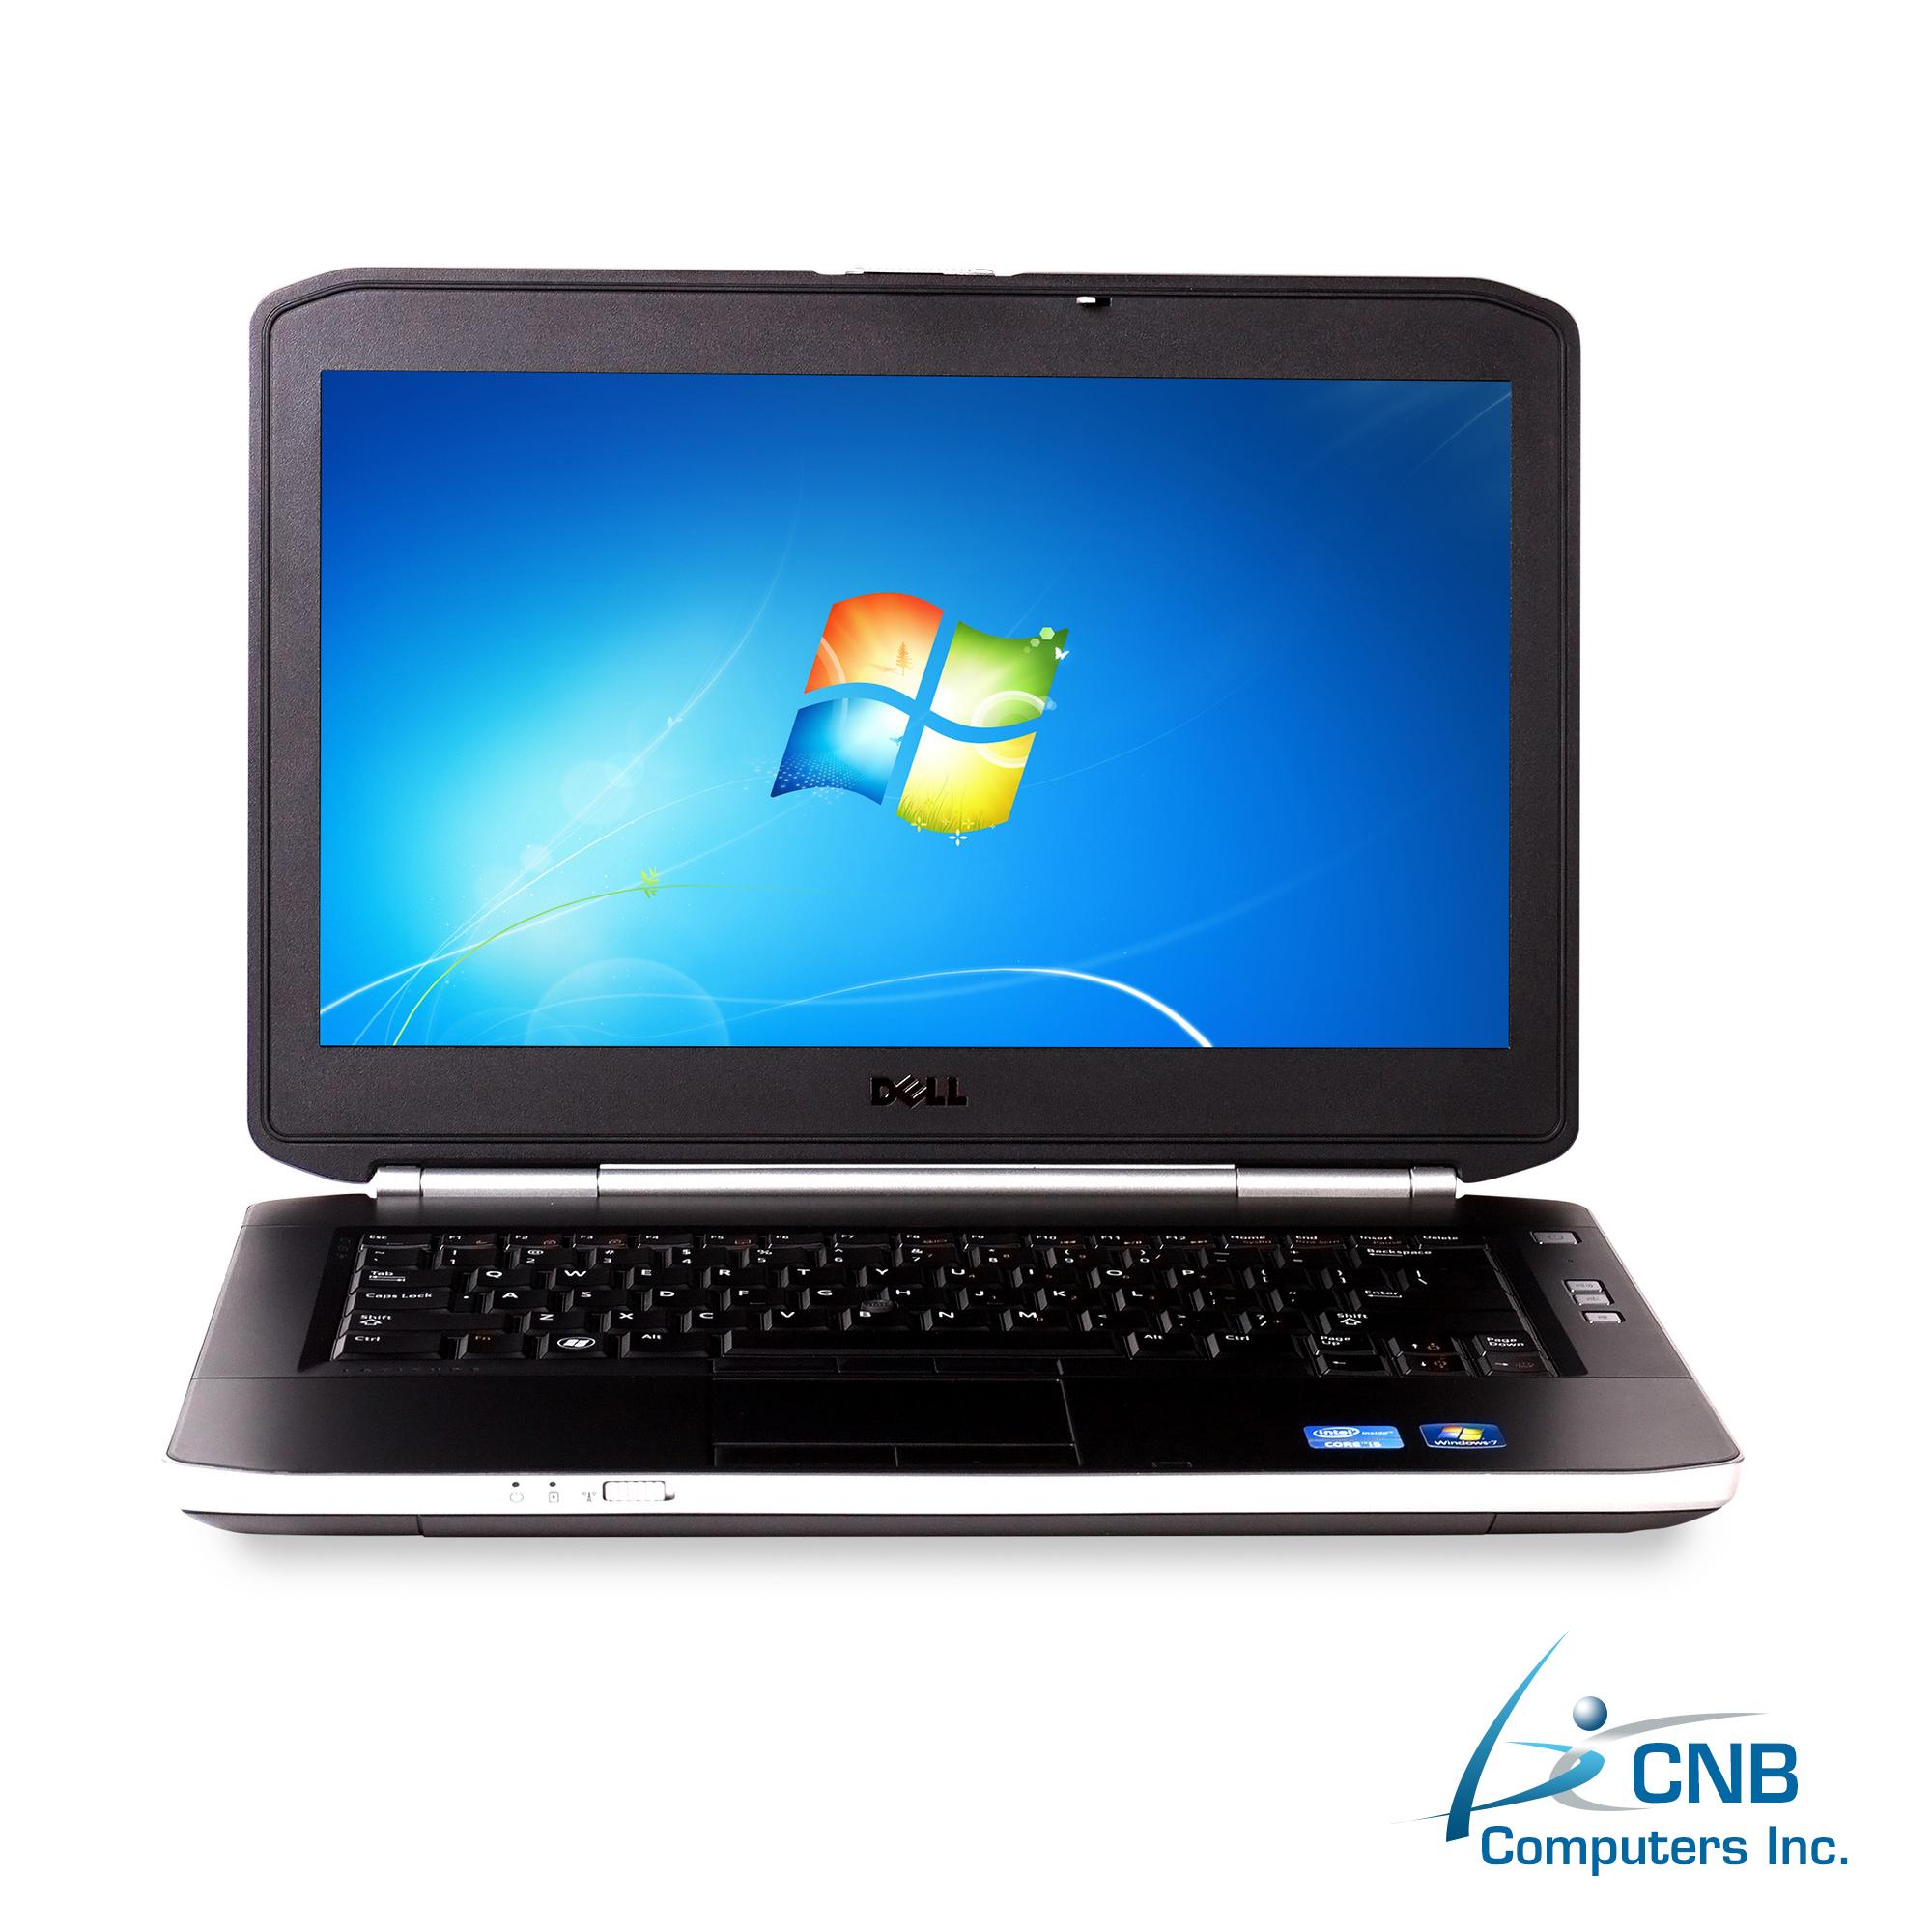 dell latitude e5420 laptop 4gb 250gb hdd intel i5 2520m. Black Bedroom Furniture Sets. Home Design Ideas